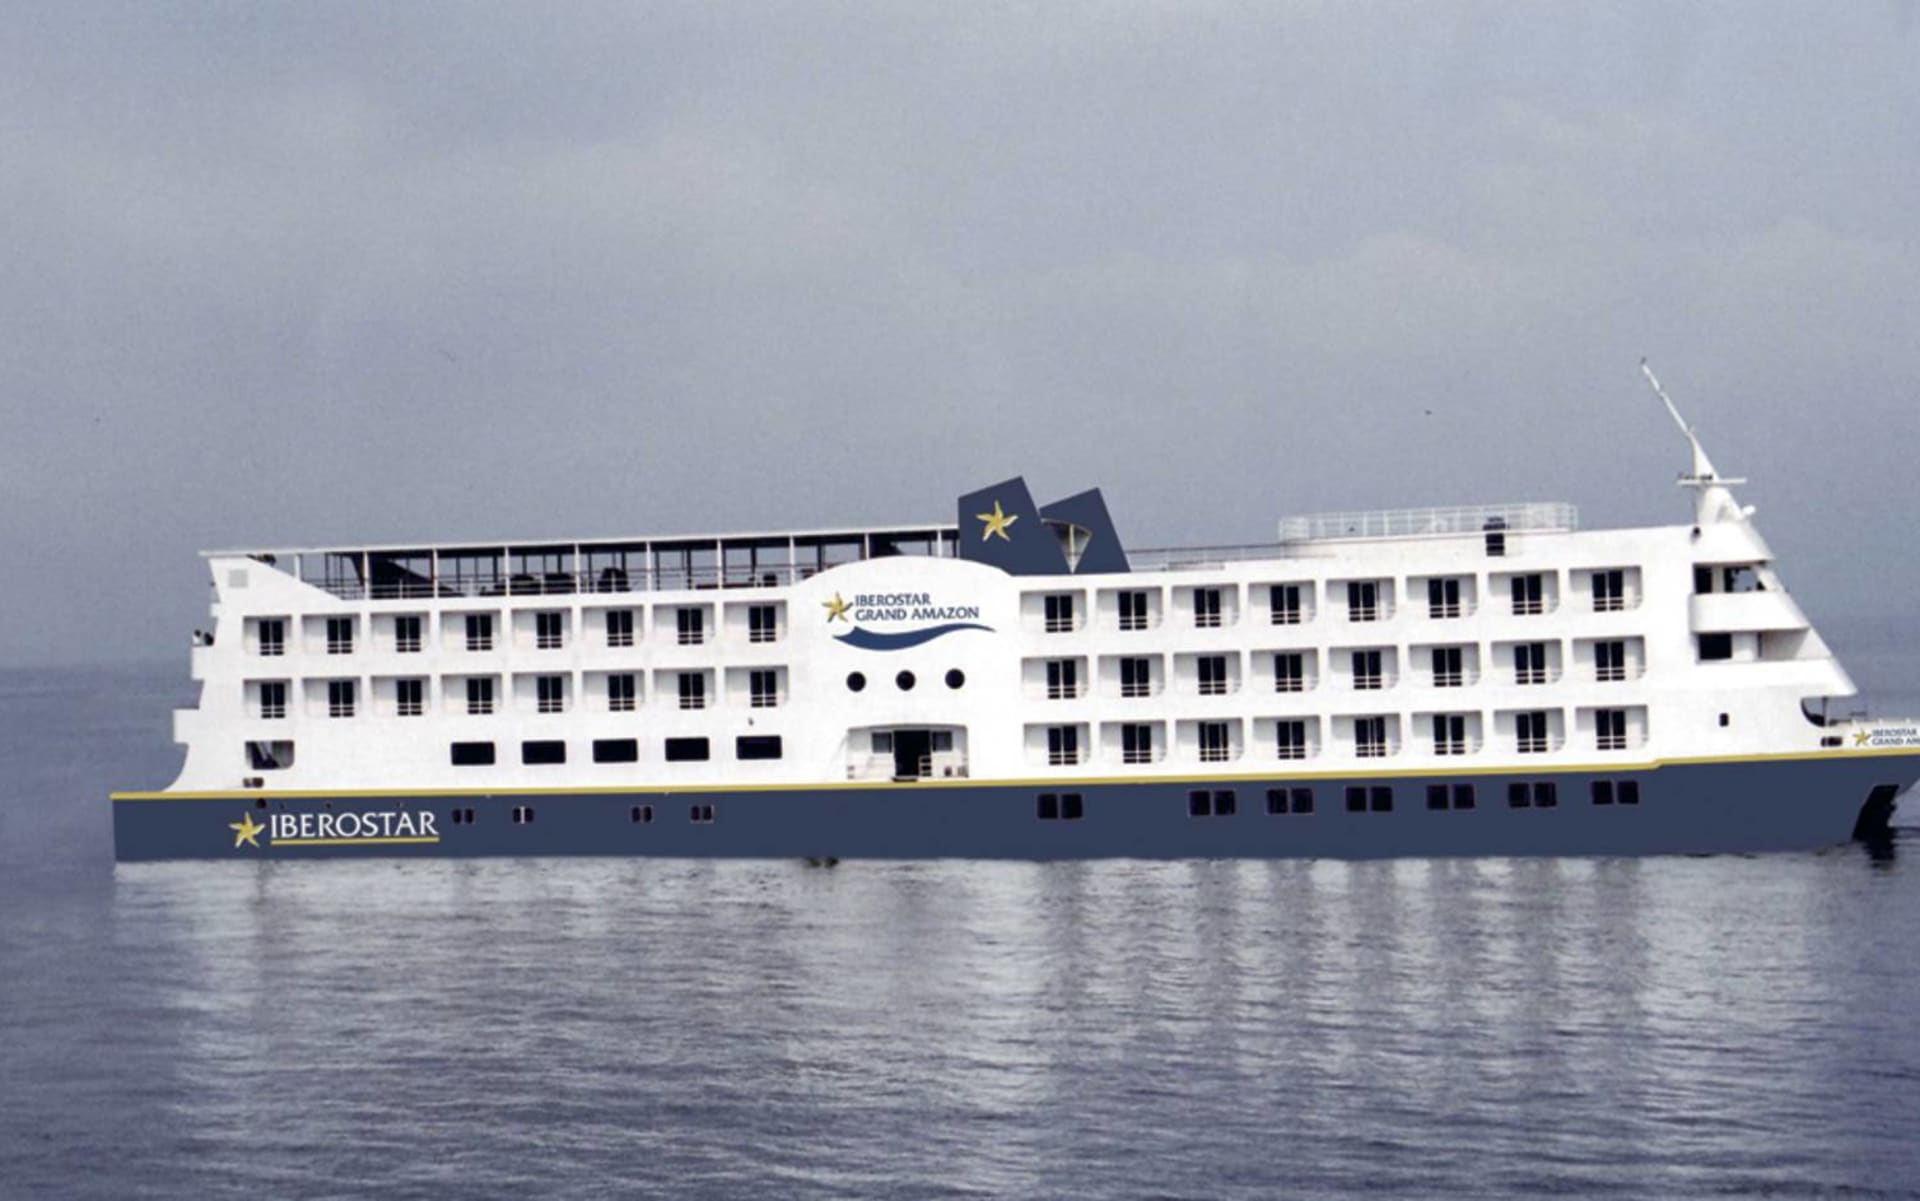 Iberostar / Rio Solimoes Programm ab Manaus: exterior: Iberostar - Aussenansicht